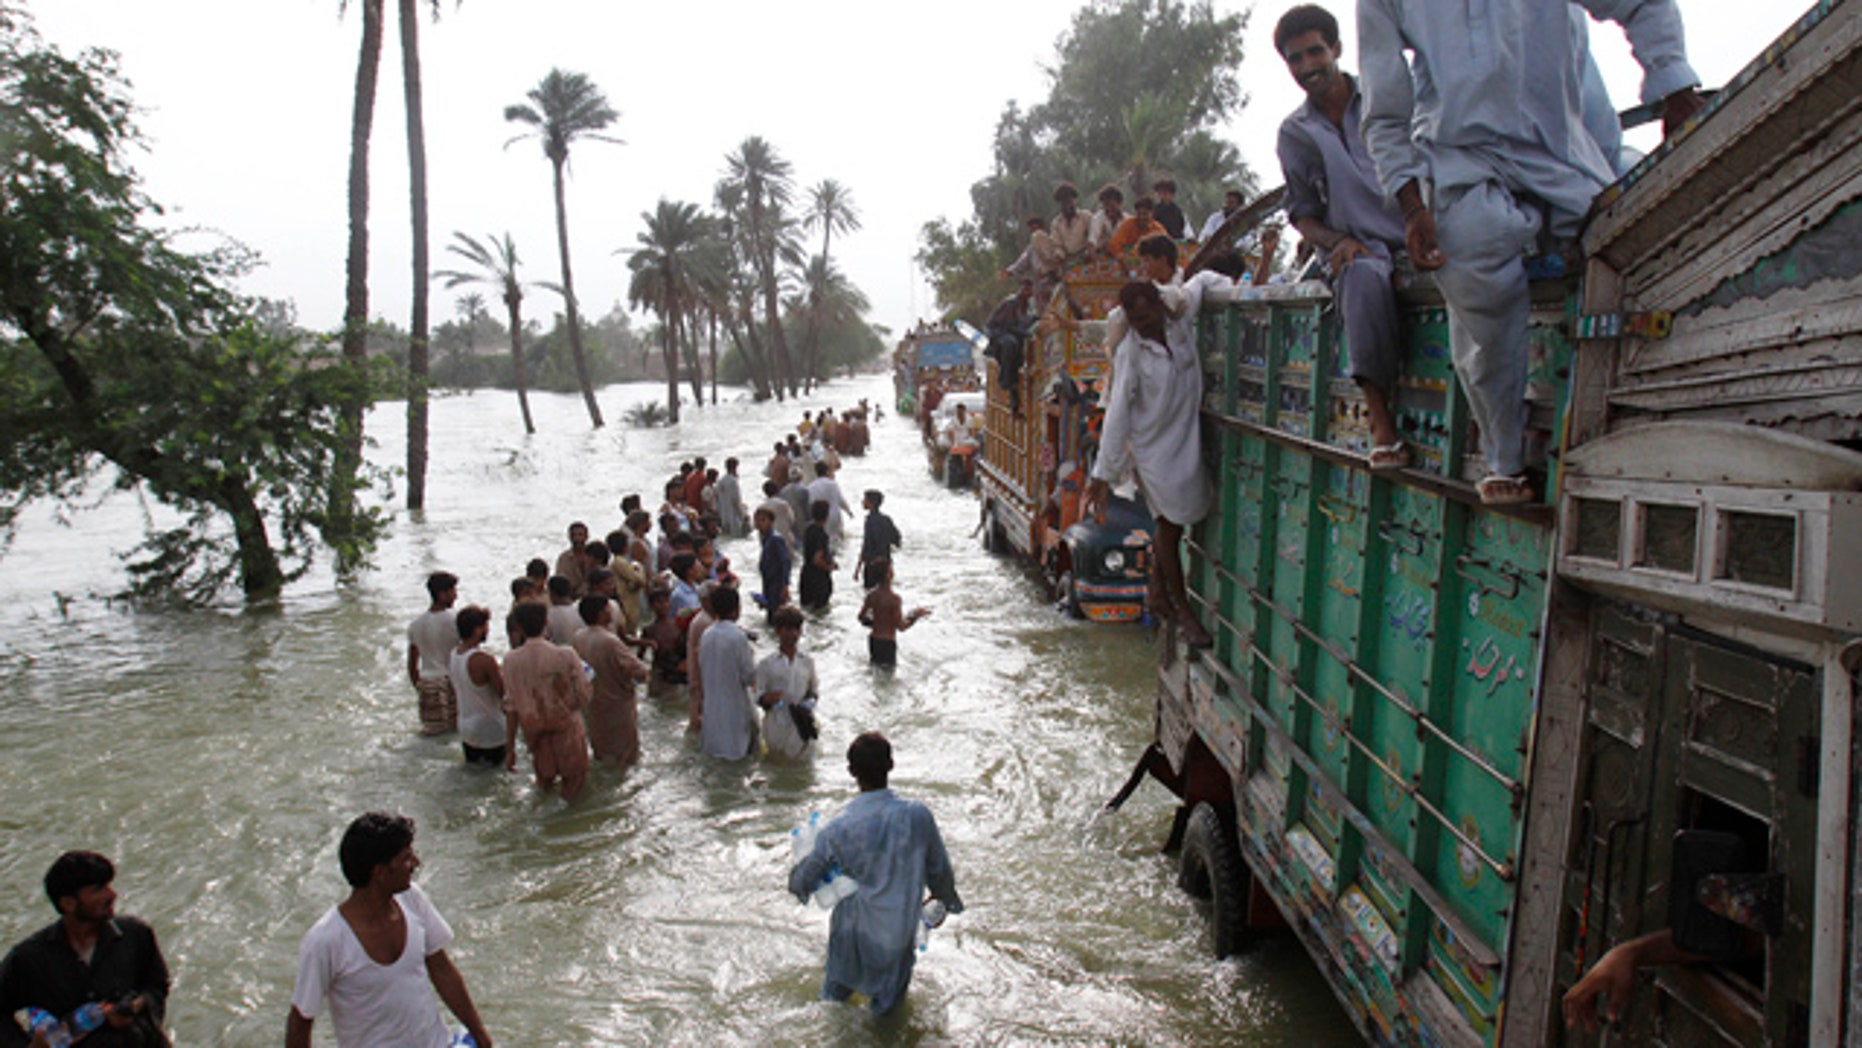 August 18: Flood survivors carry relief goods along a flooded area in Muzaffargarh, Punjab province, in Pakistan. (AP)